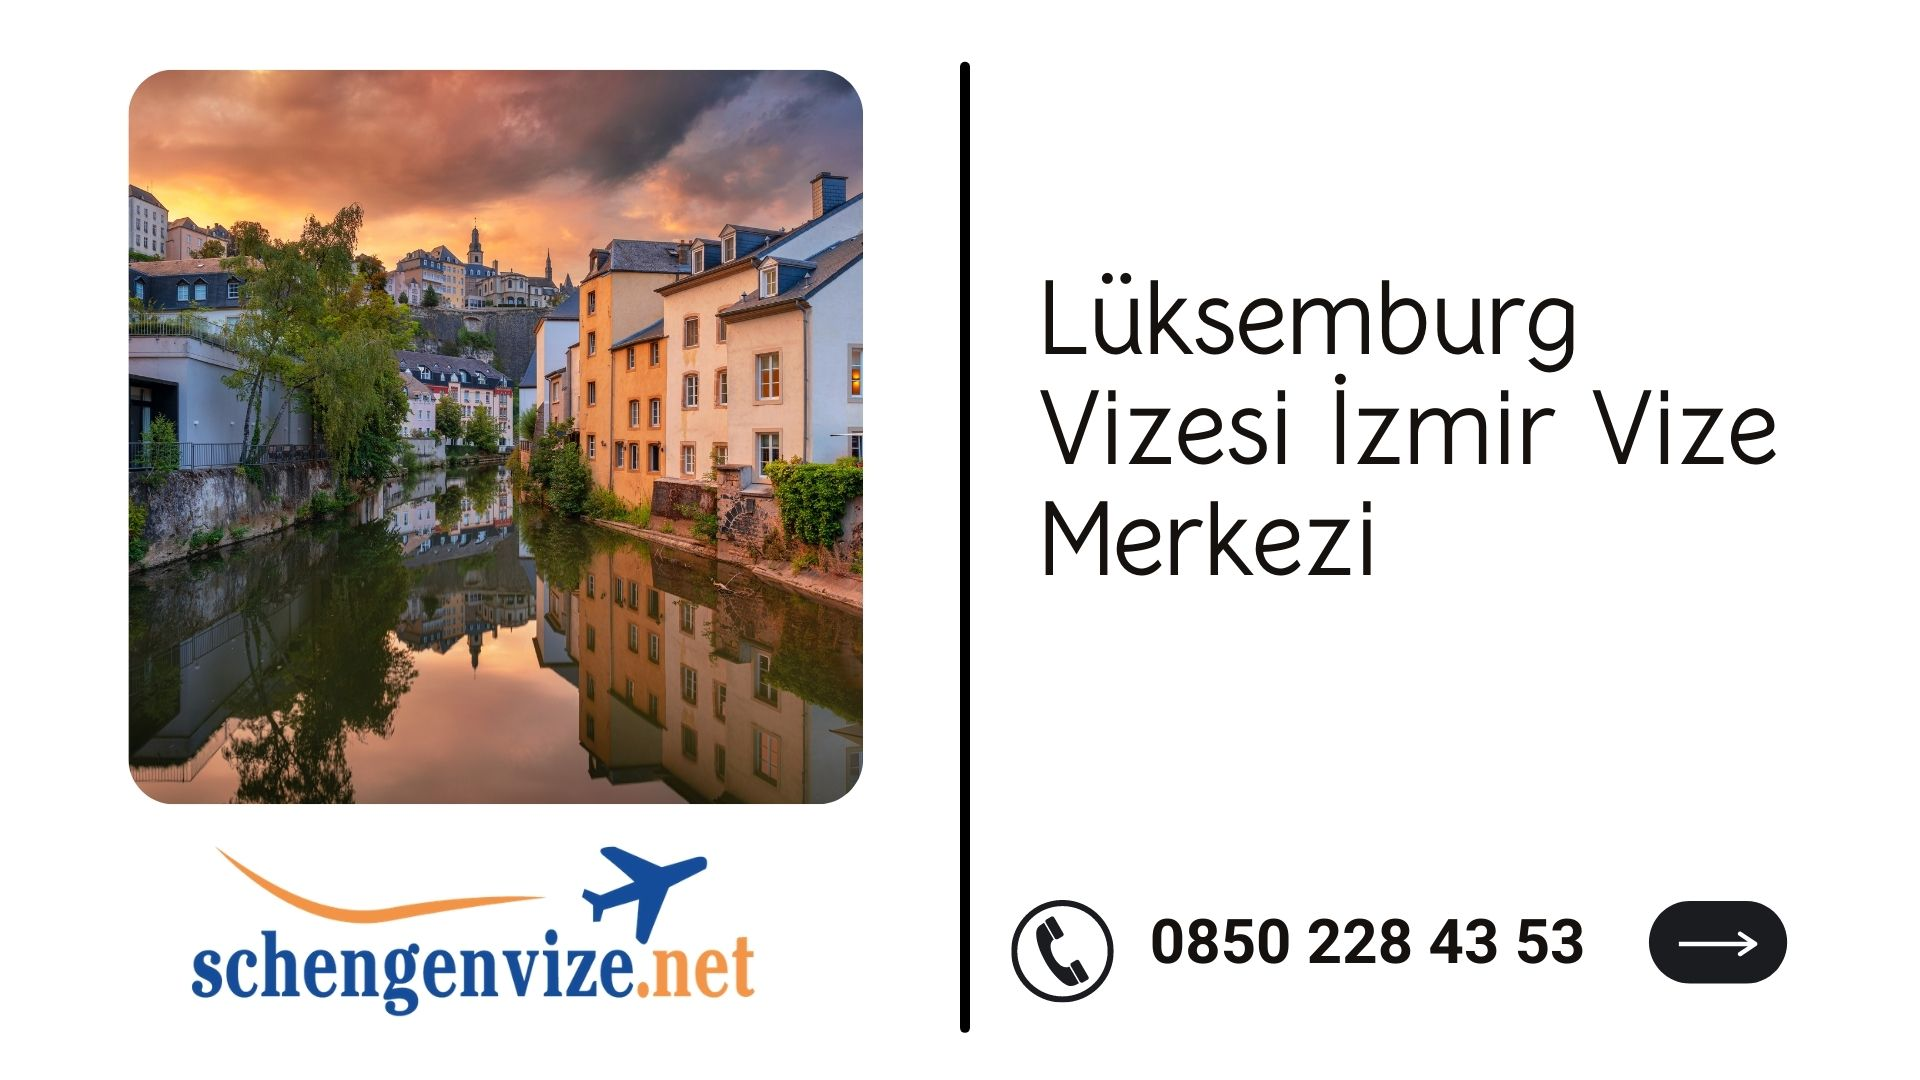 Lüksemburg Vizesi İzmir Vize Merkezi